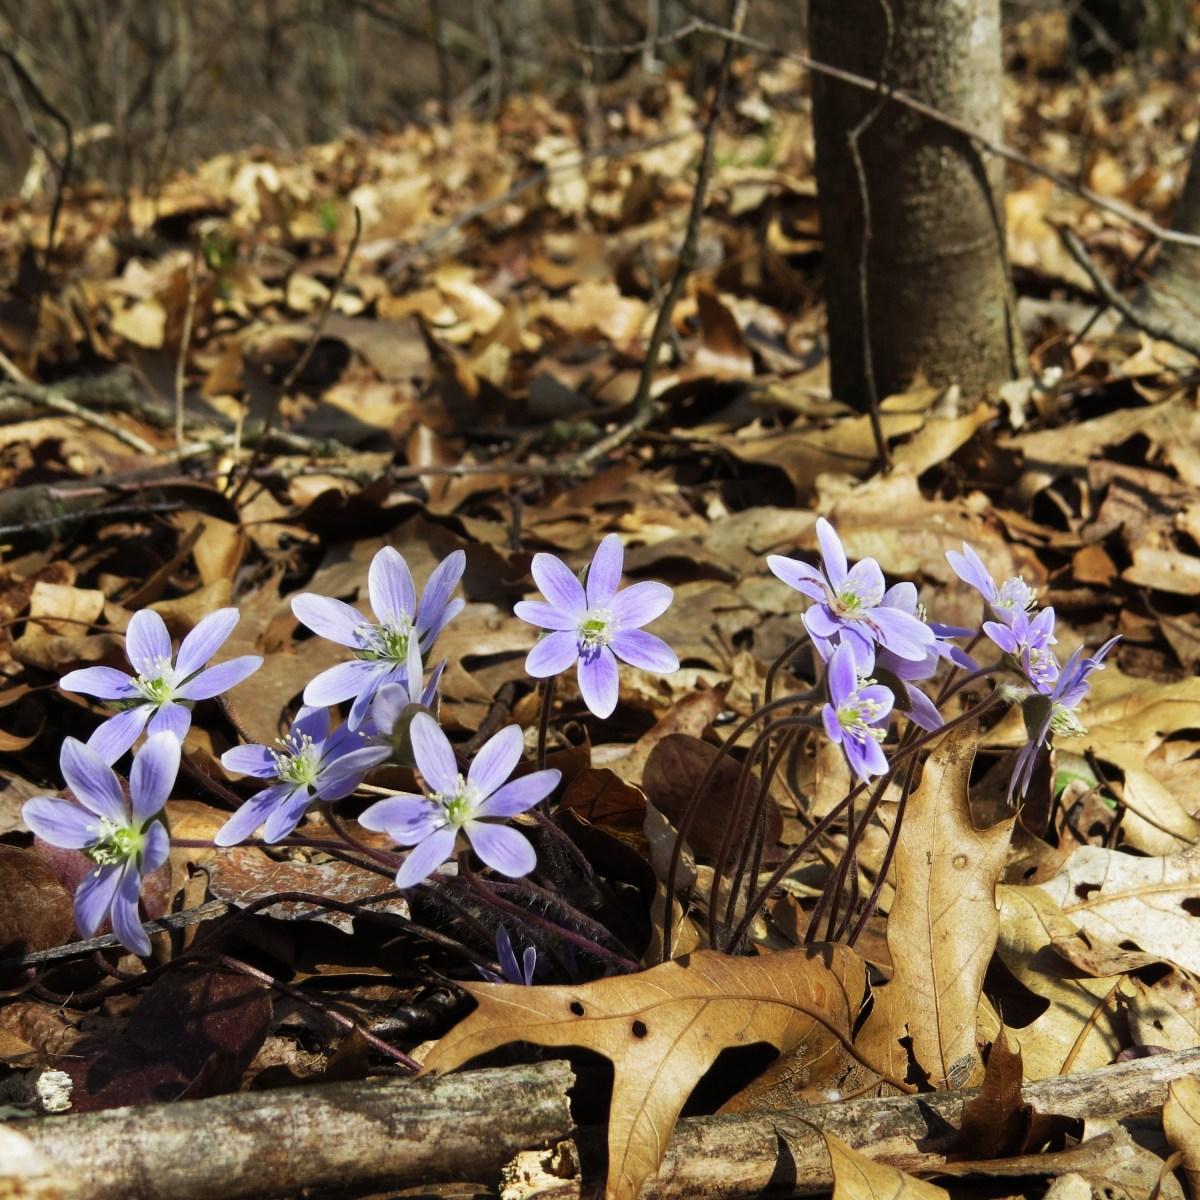 Round-lobed hepatica blooms emerge through dry, fallen leaves